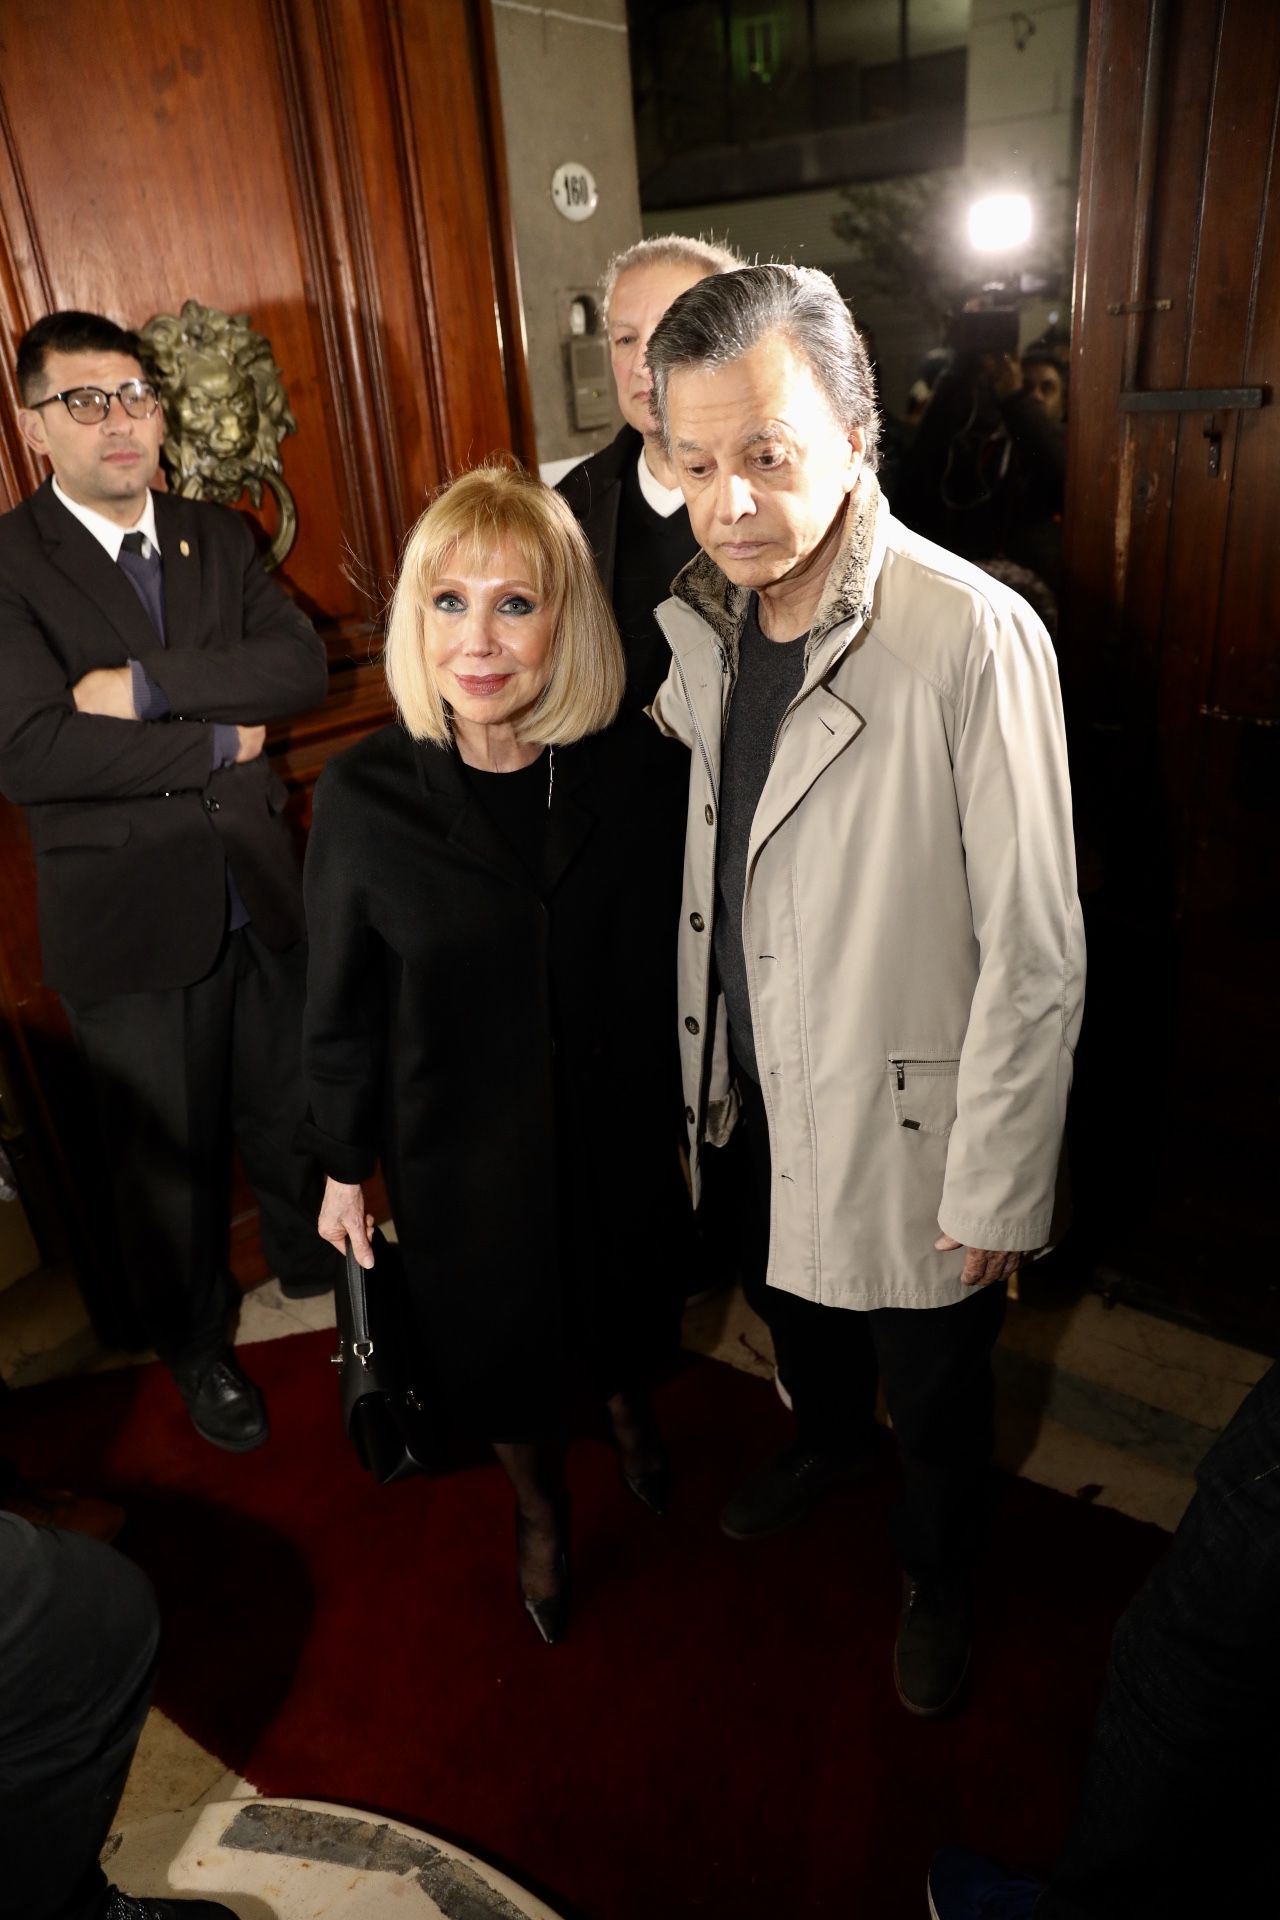 "Evangelina Salazar y Ramón ""Palito"" Ortega"" (Foto: Teleshow/Chule Valerga)"